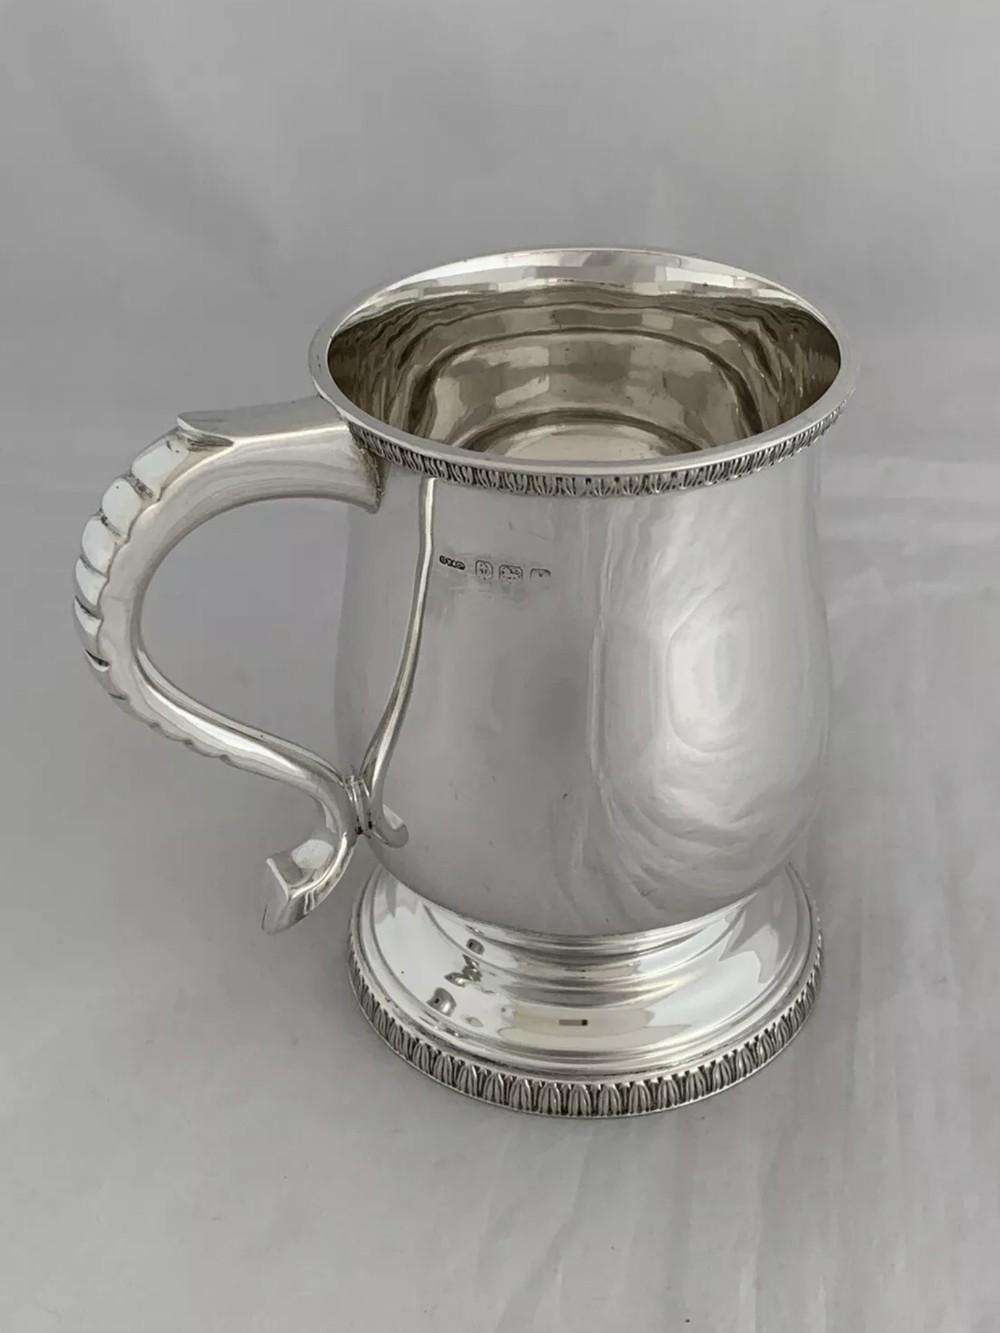 solid silver half pint mug art deco 1948 birmingham heavy sterling silver